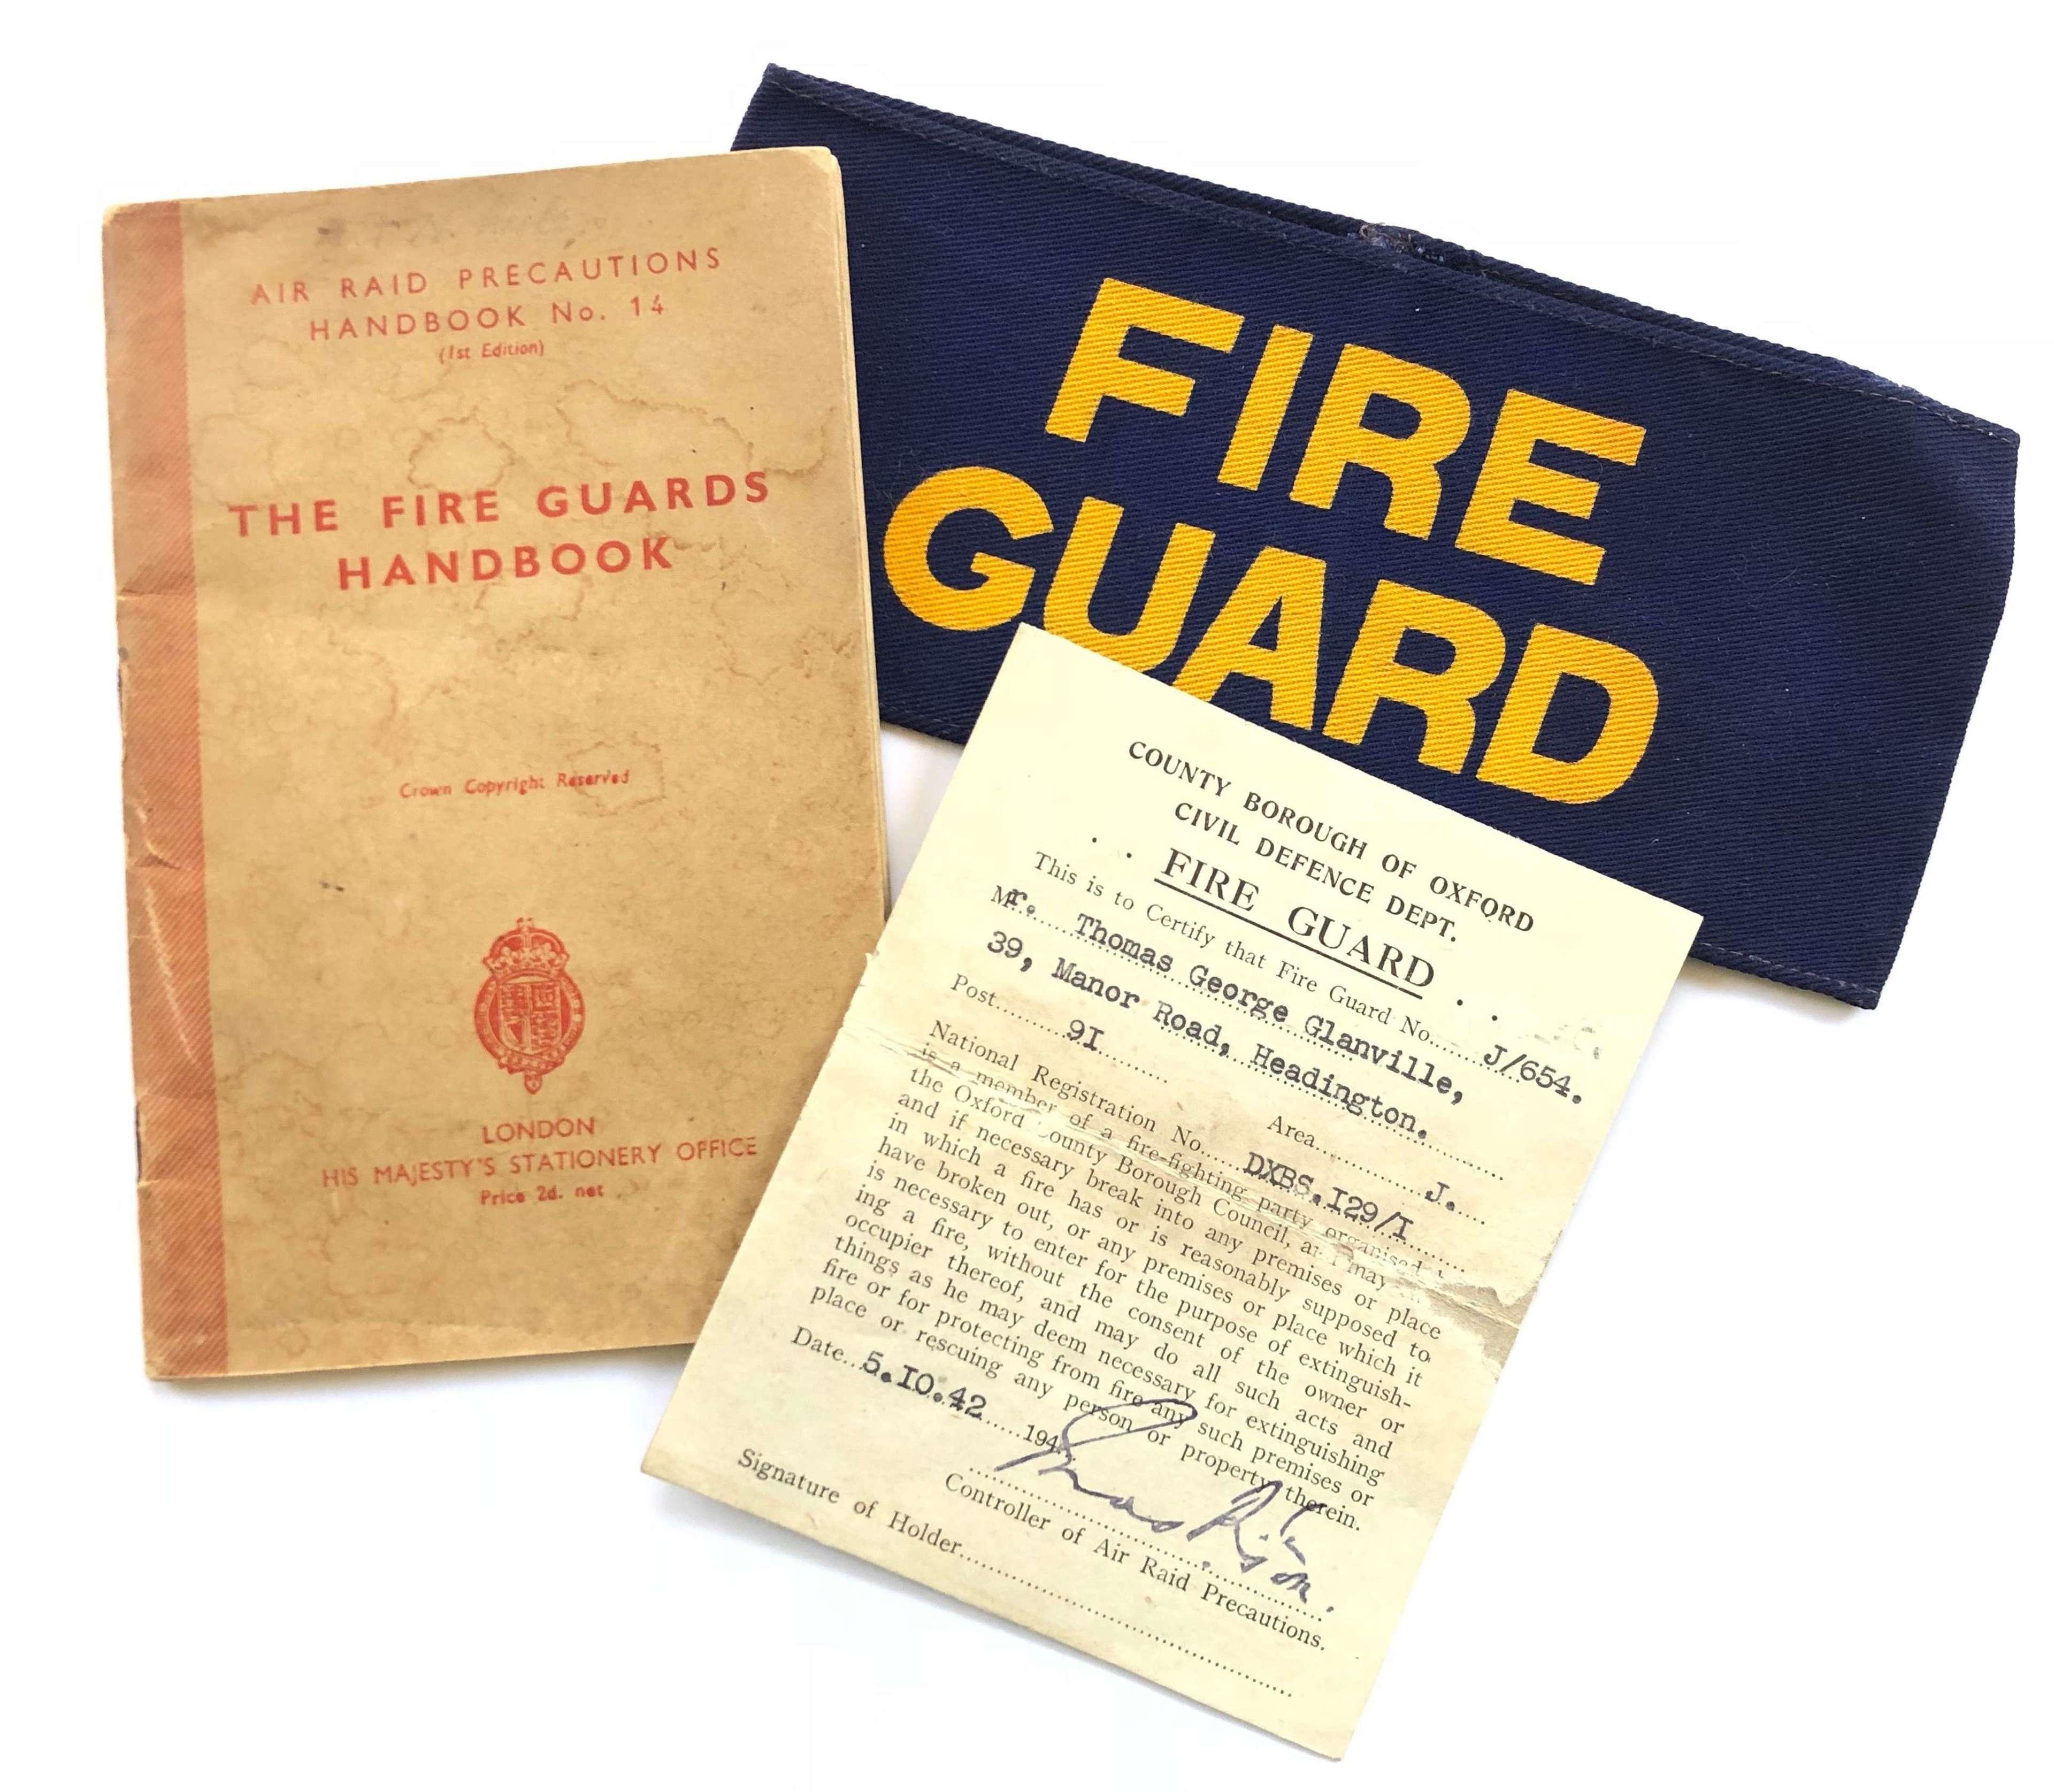 WW2 1942 Home Front Oxfordshire Headington Fire Guard Items